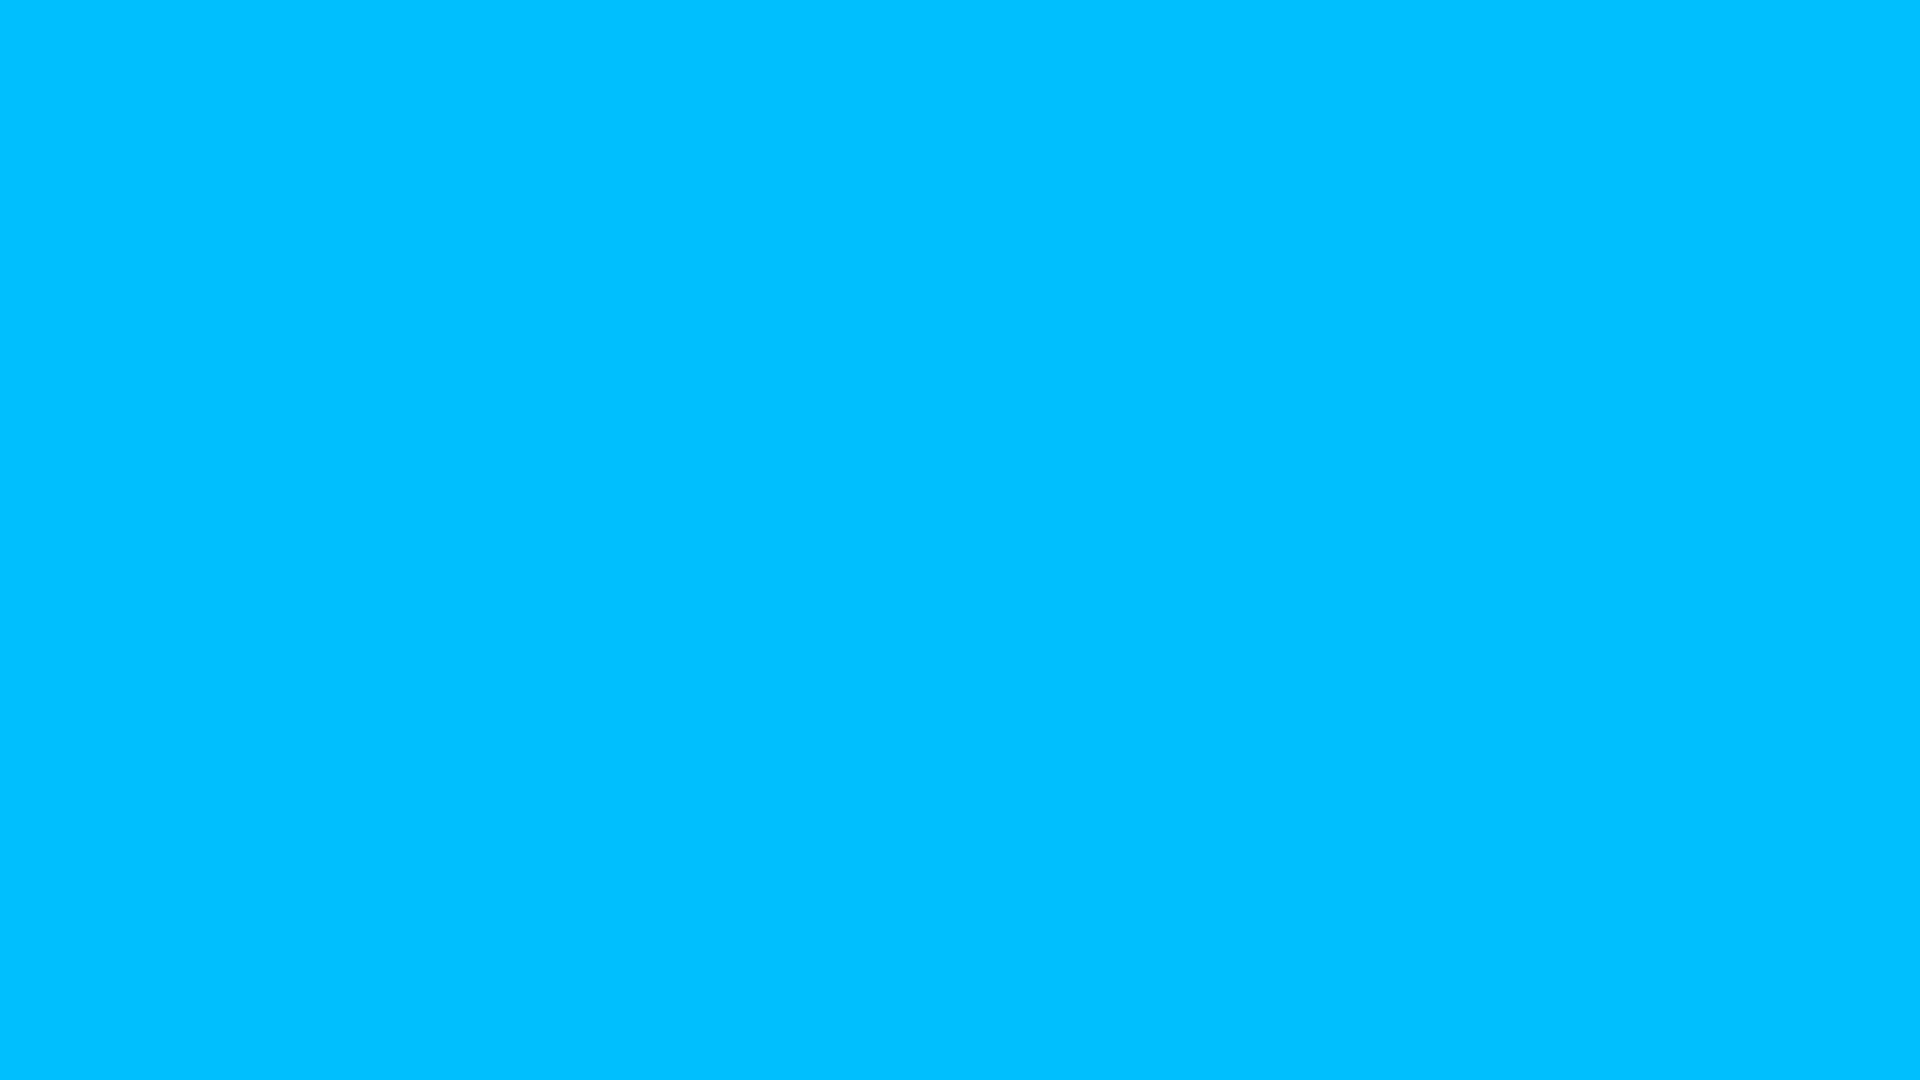 1920x1080 Deep Sky Blue Solid Color Background